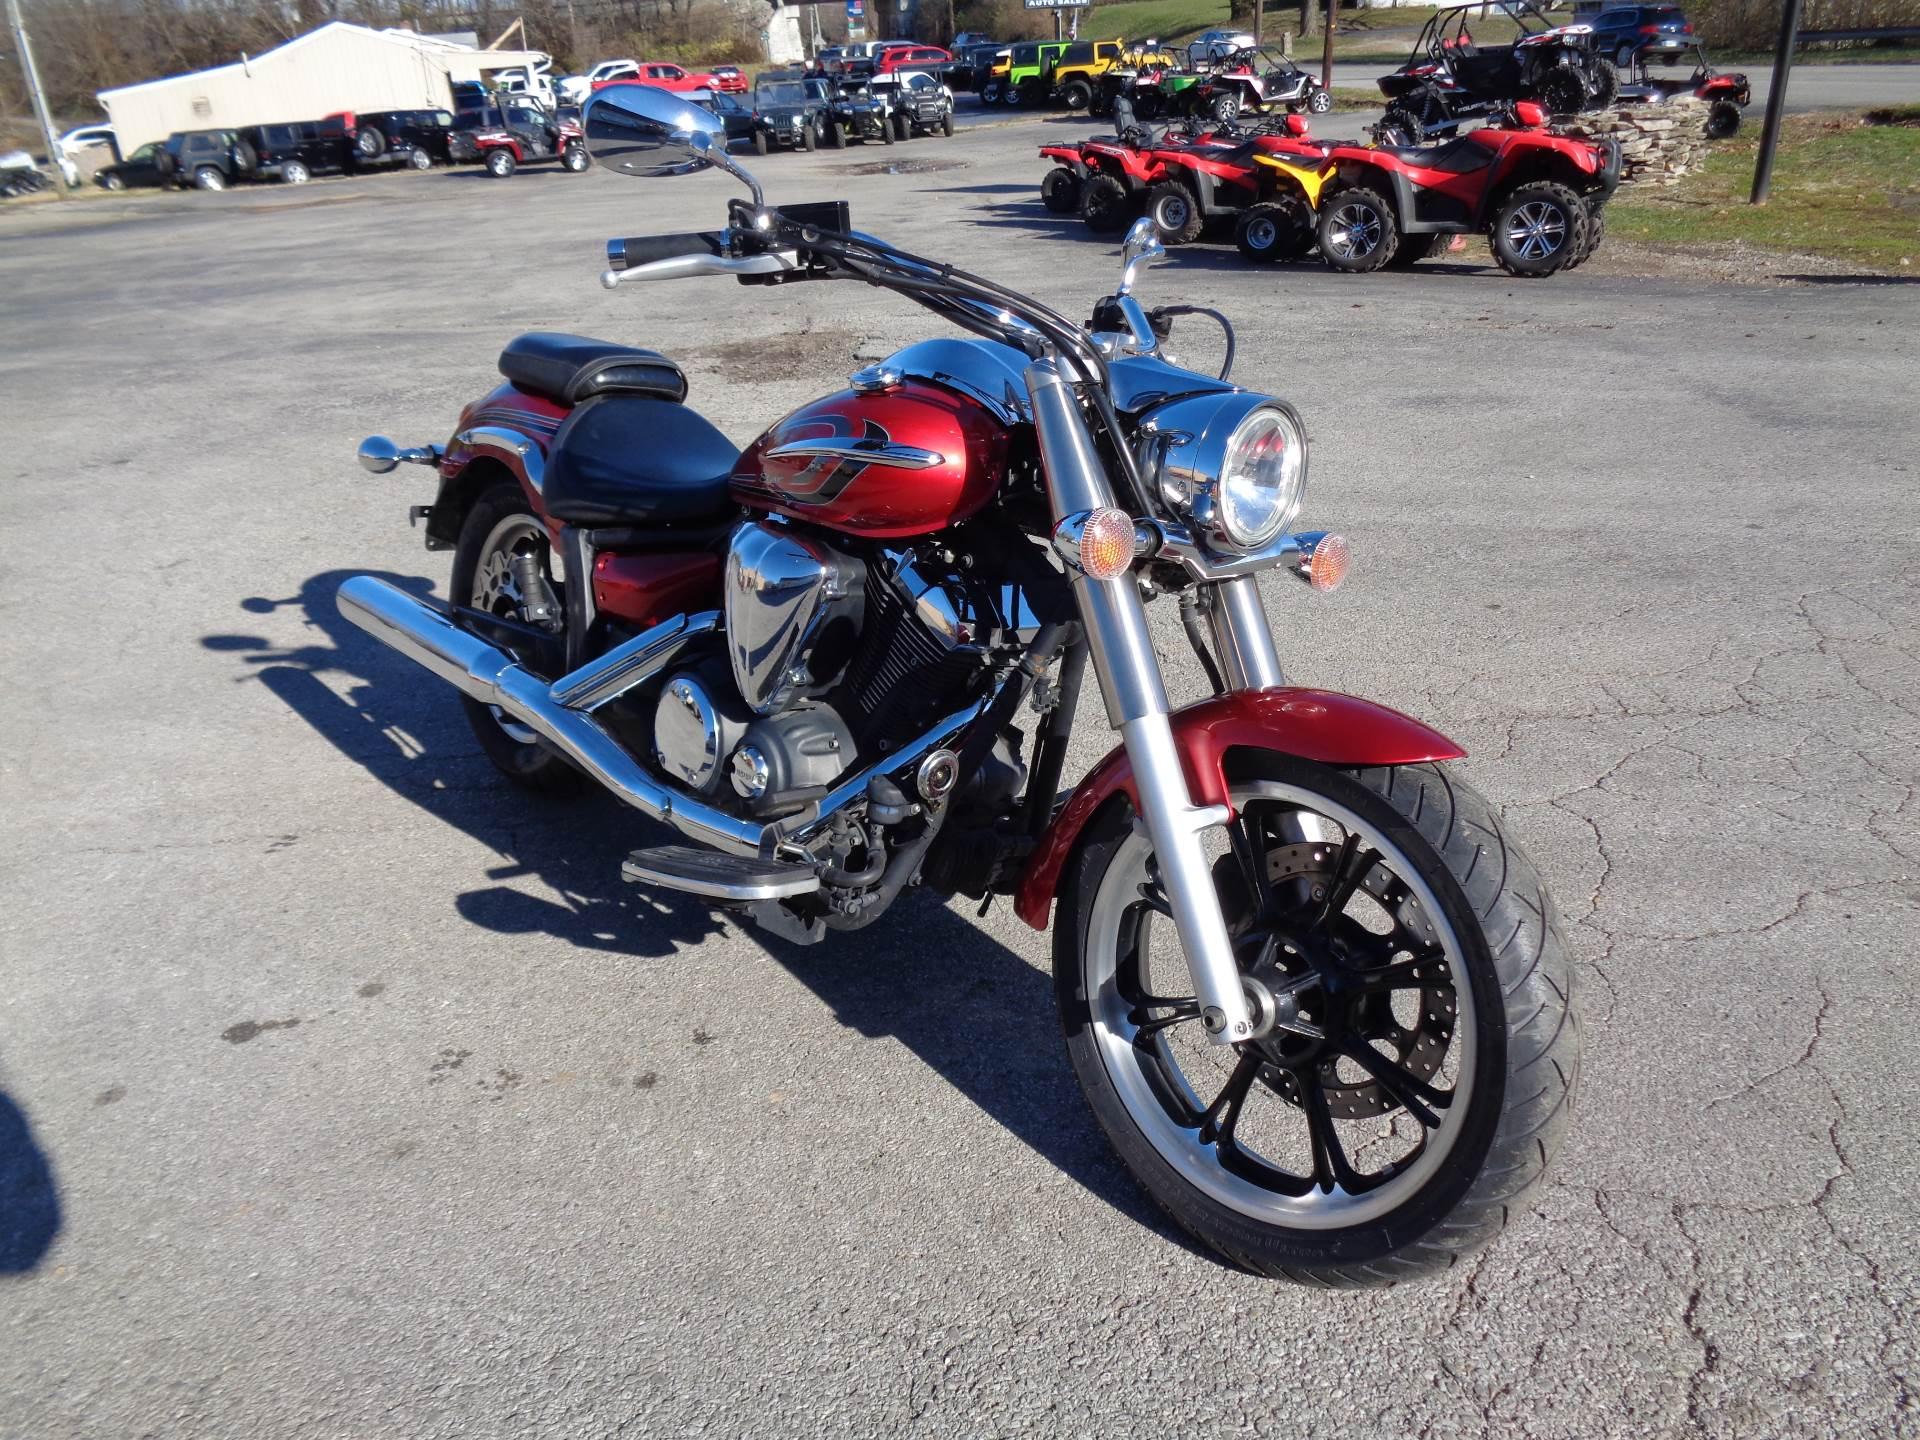 2014 Yamaha V Star 950 In Georgetown Kentucky